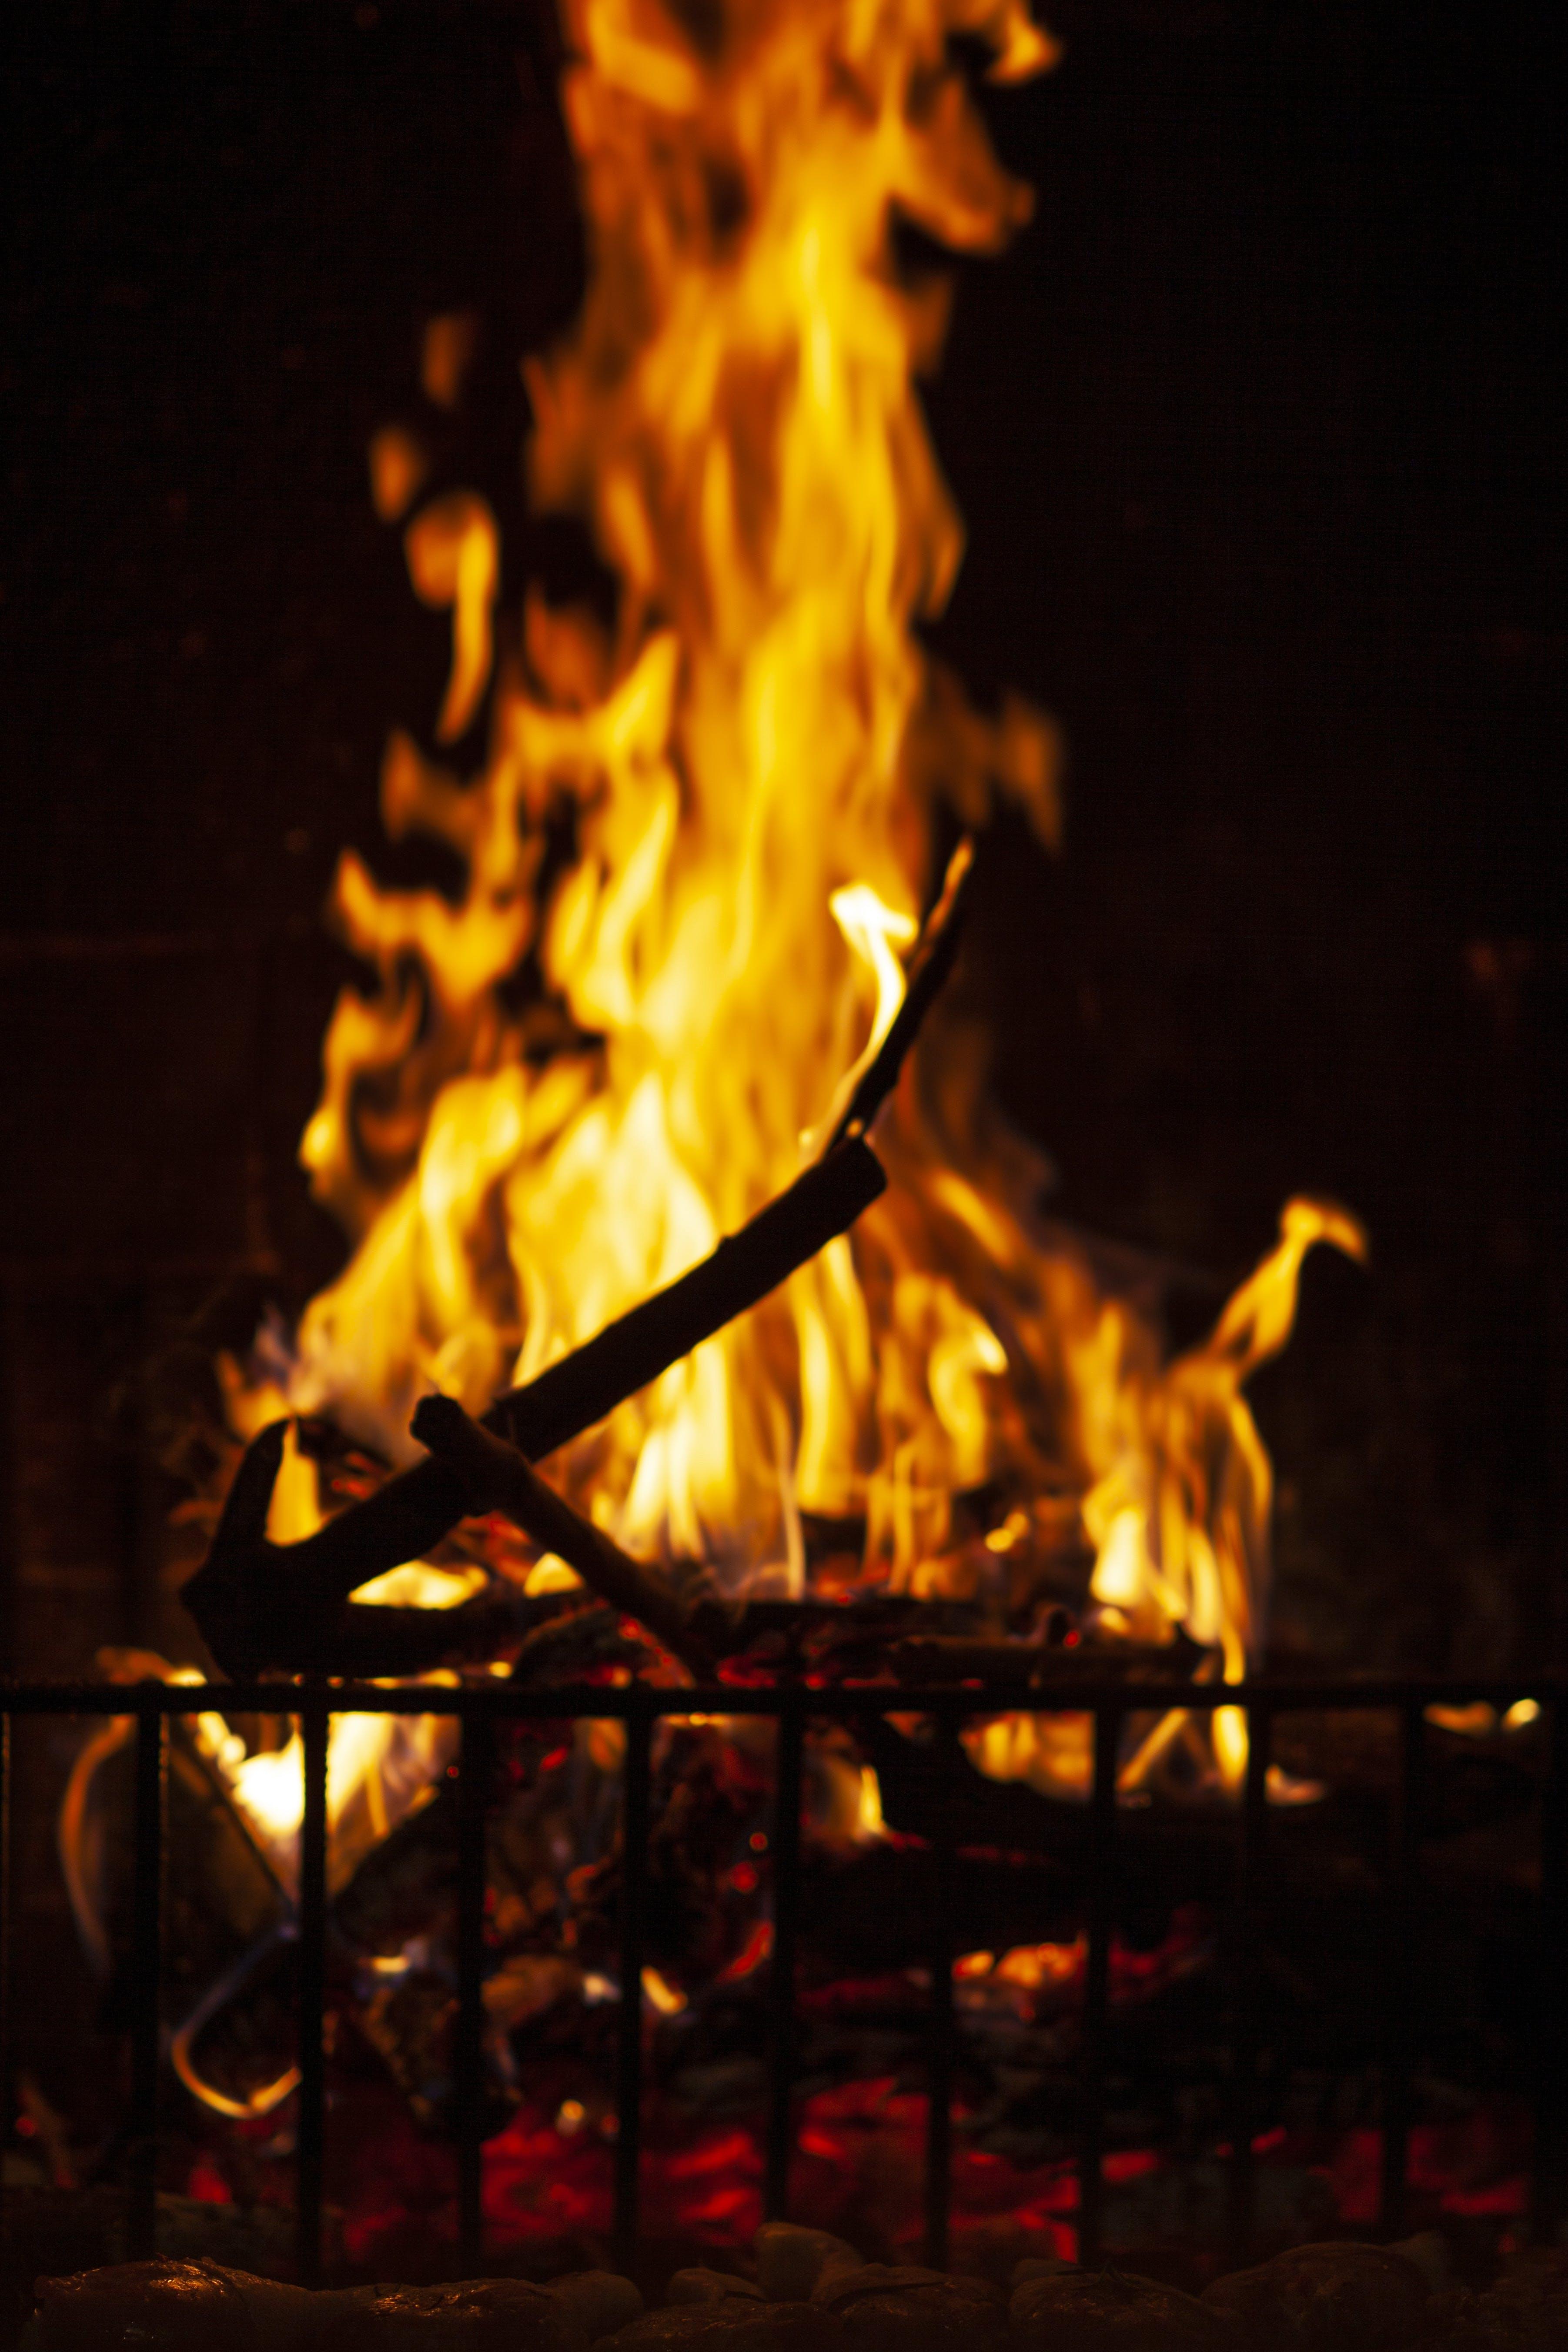 Bonfire Close-up Photo